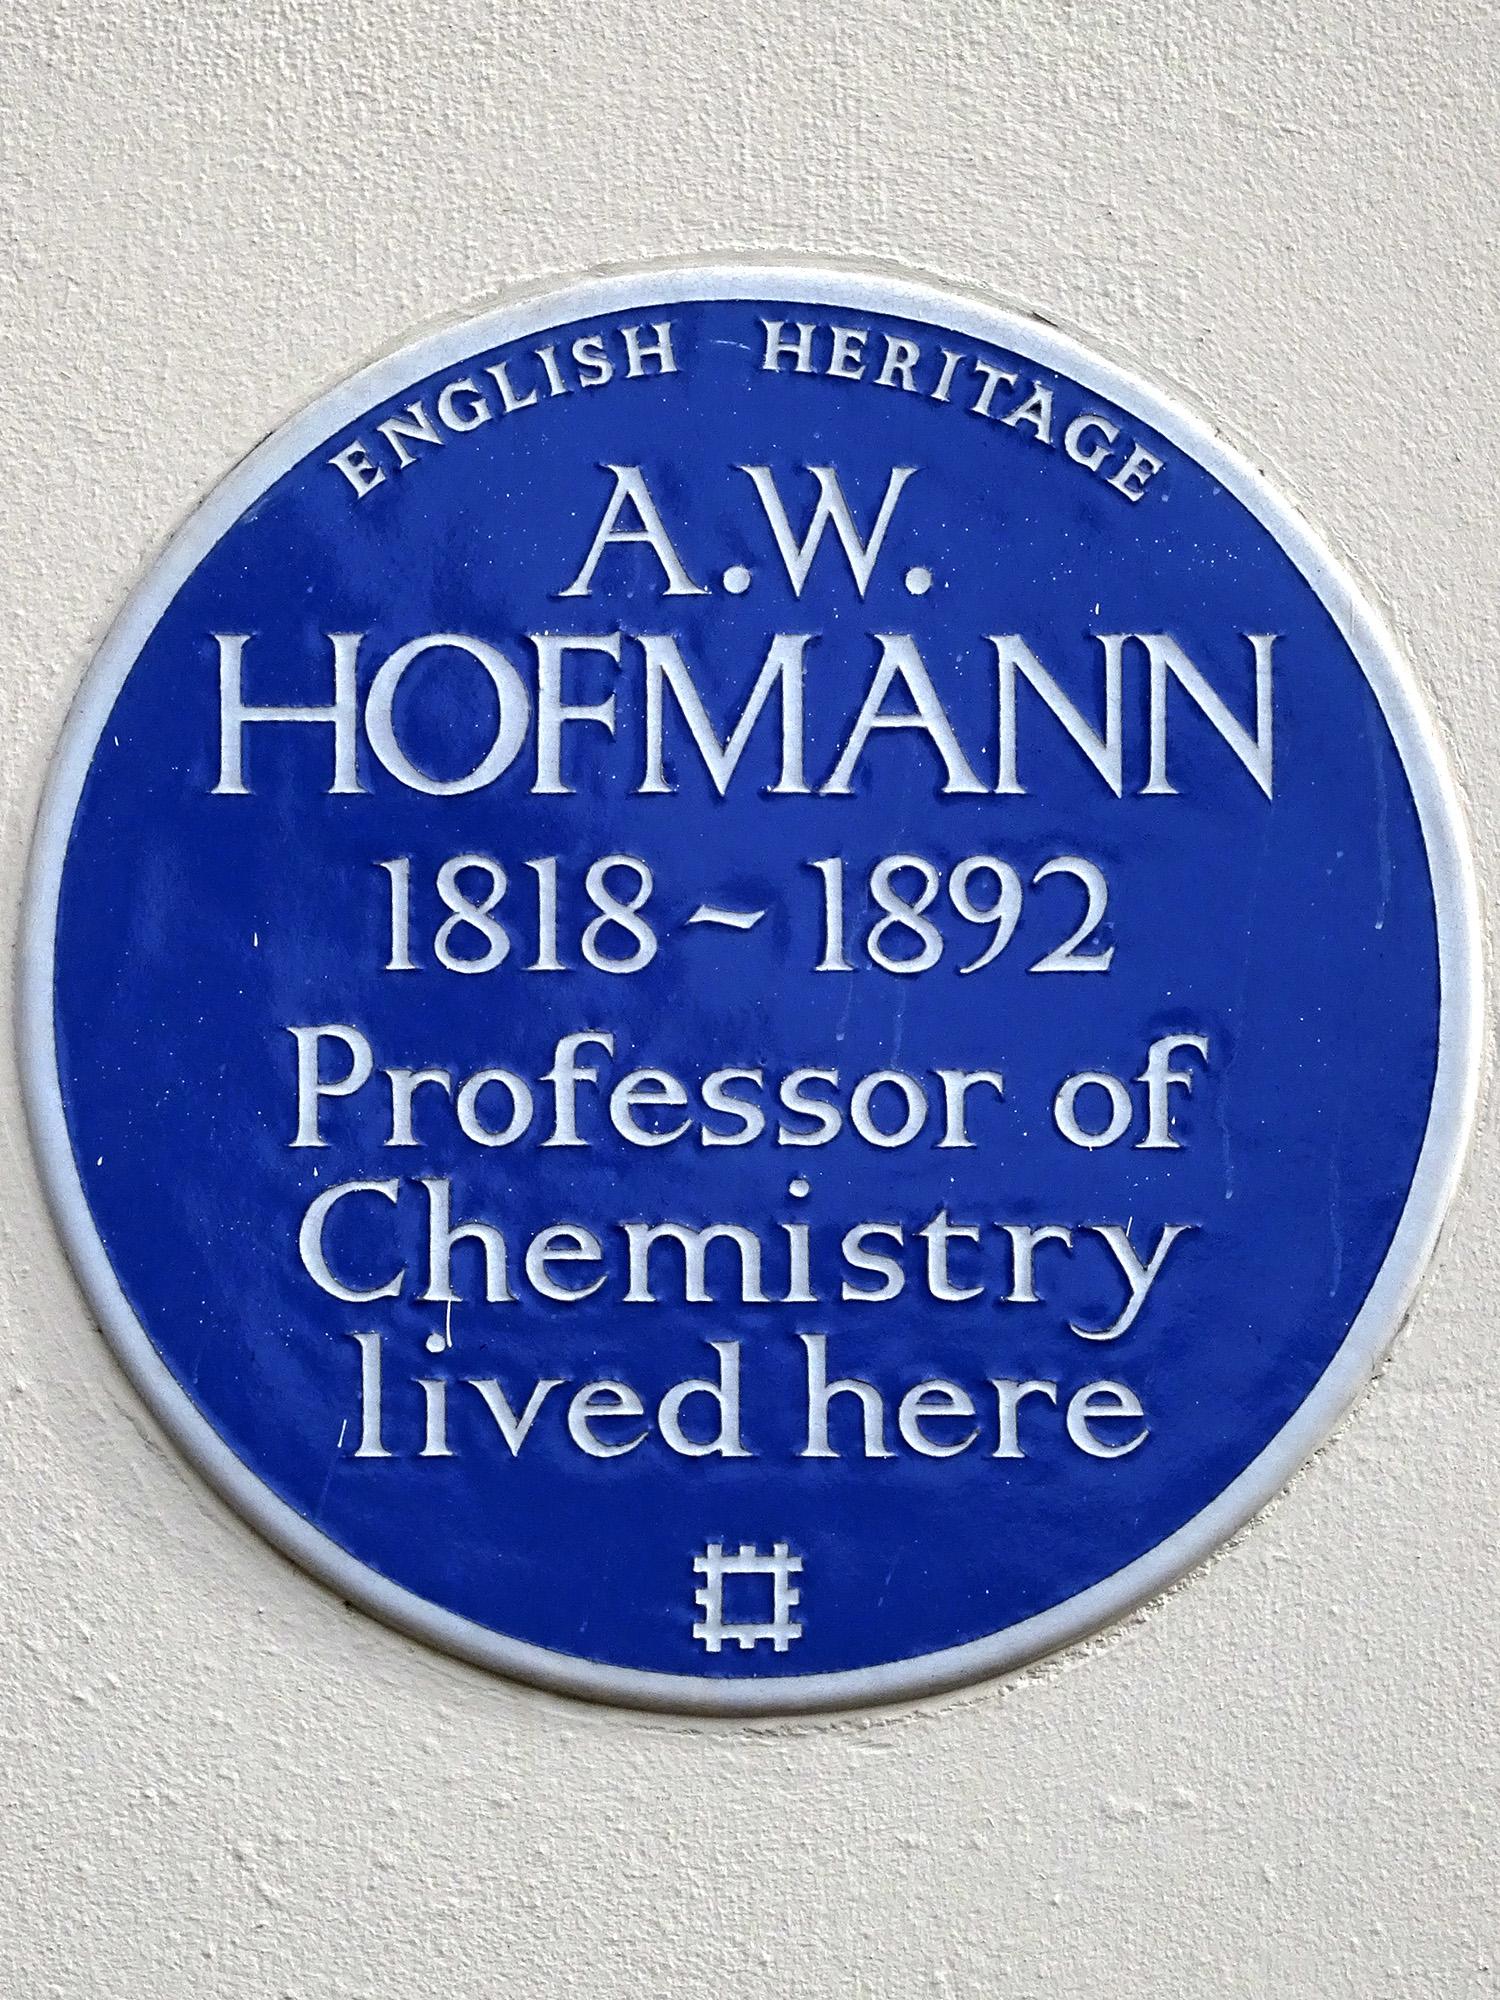 A.W. HOFMANN 1818-1892 Professor of Chemistry lived here.jpg